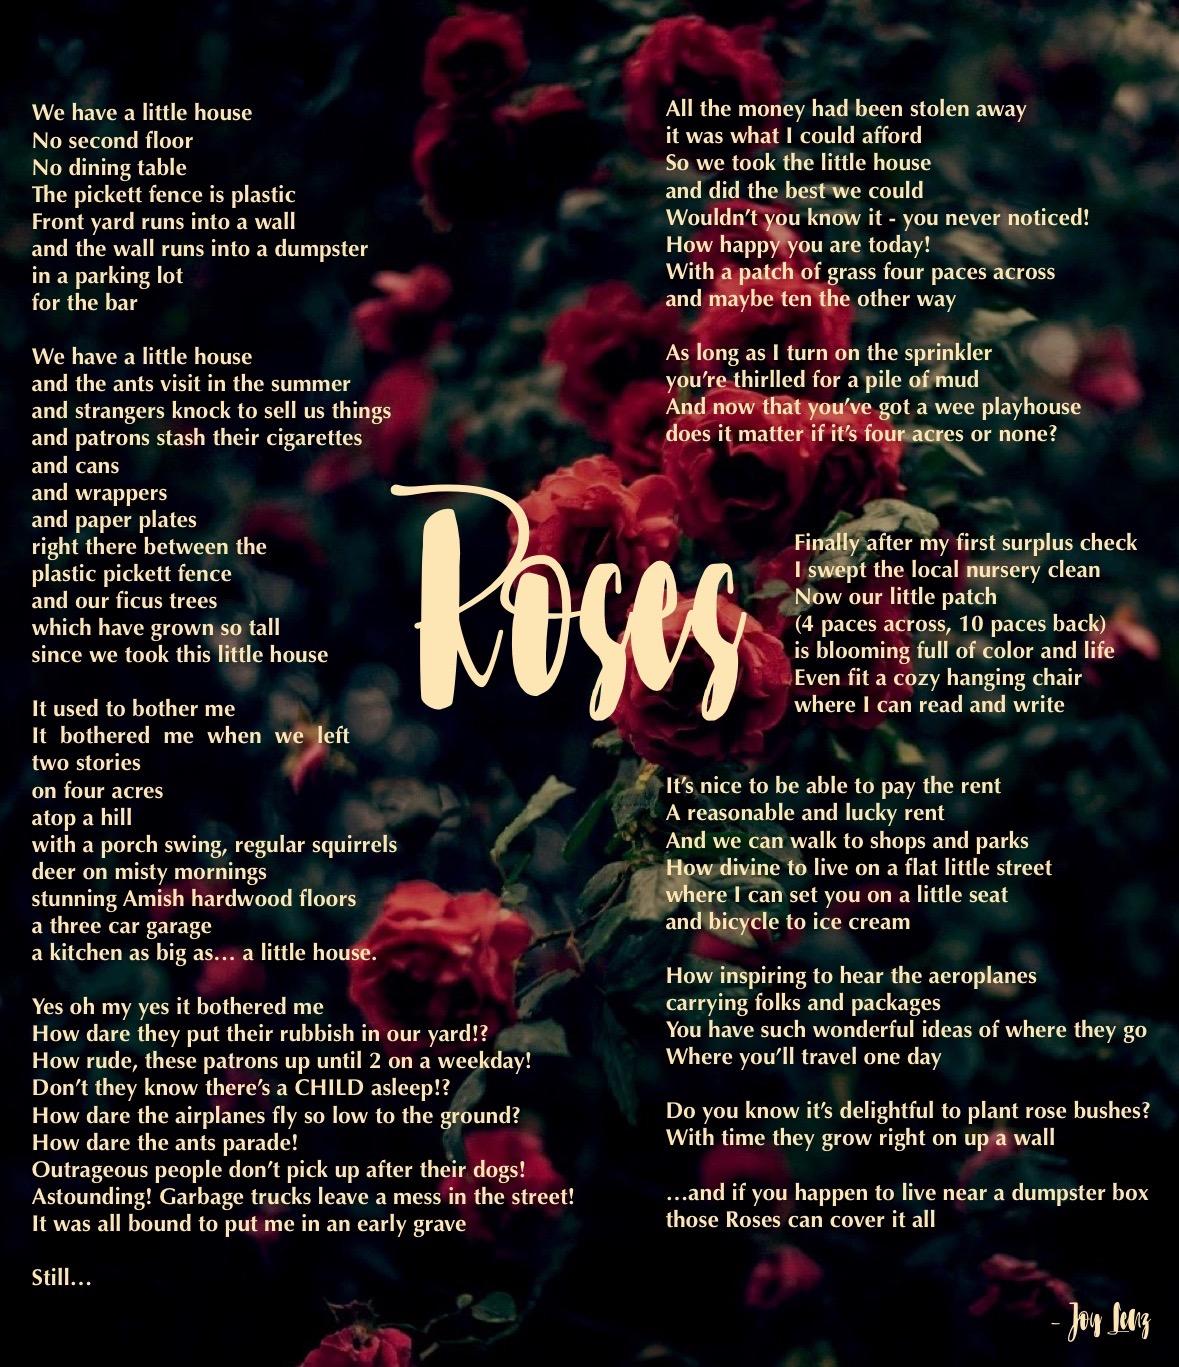 Roses poem by Bethany Joy Lenz - Modern Vintage life